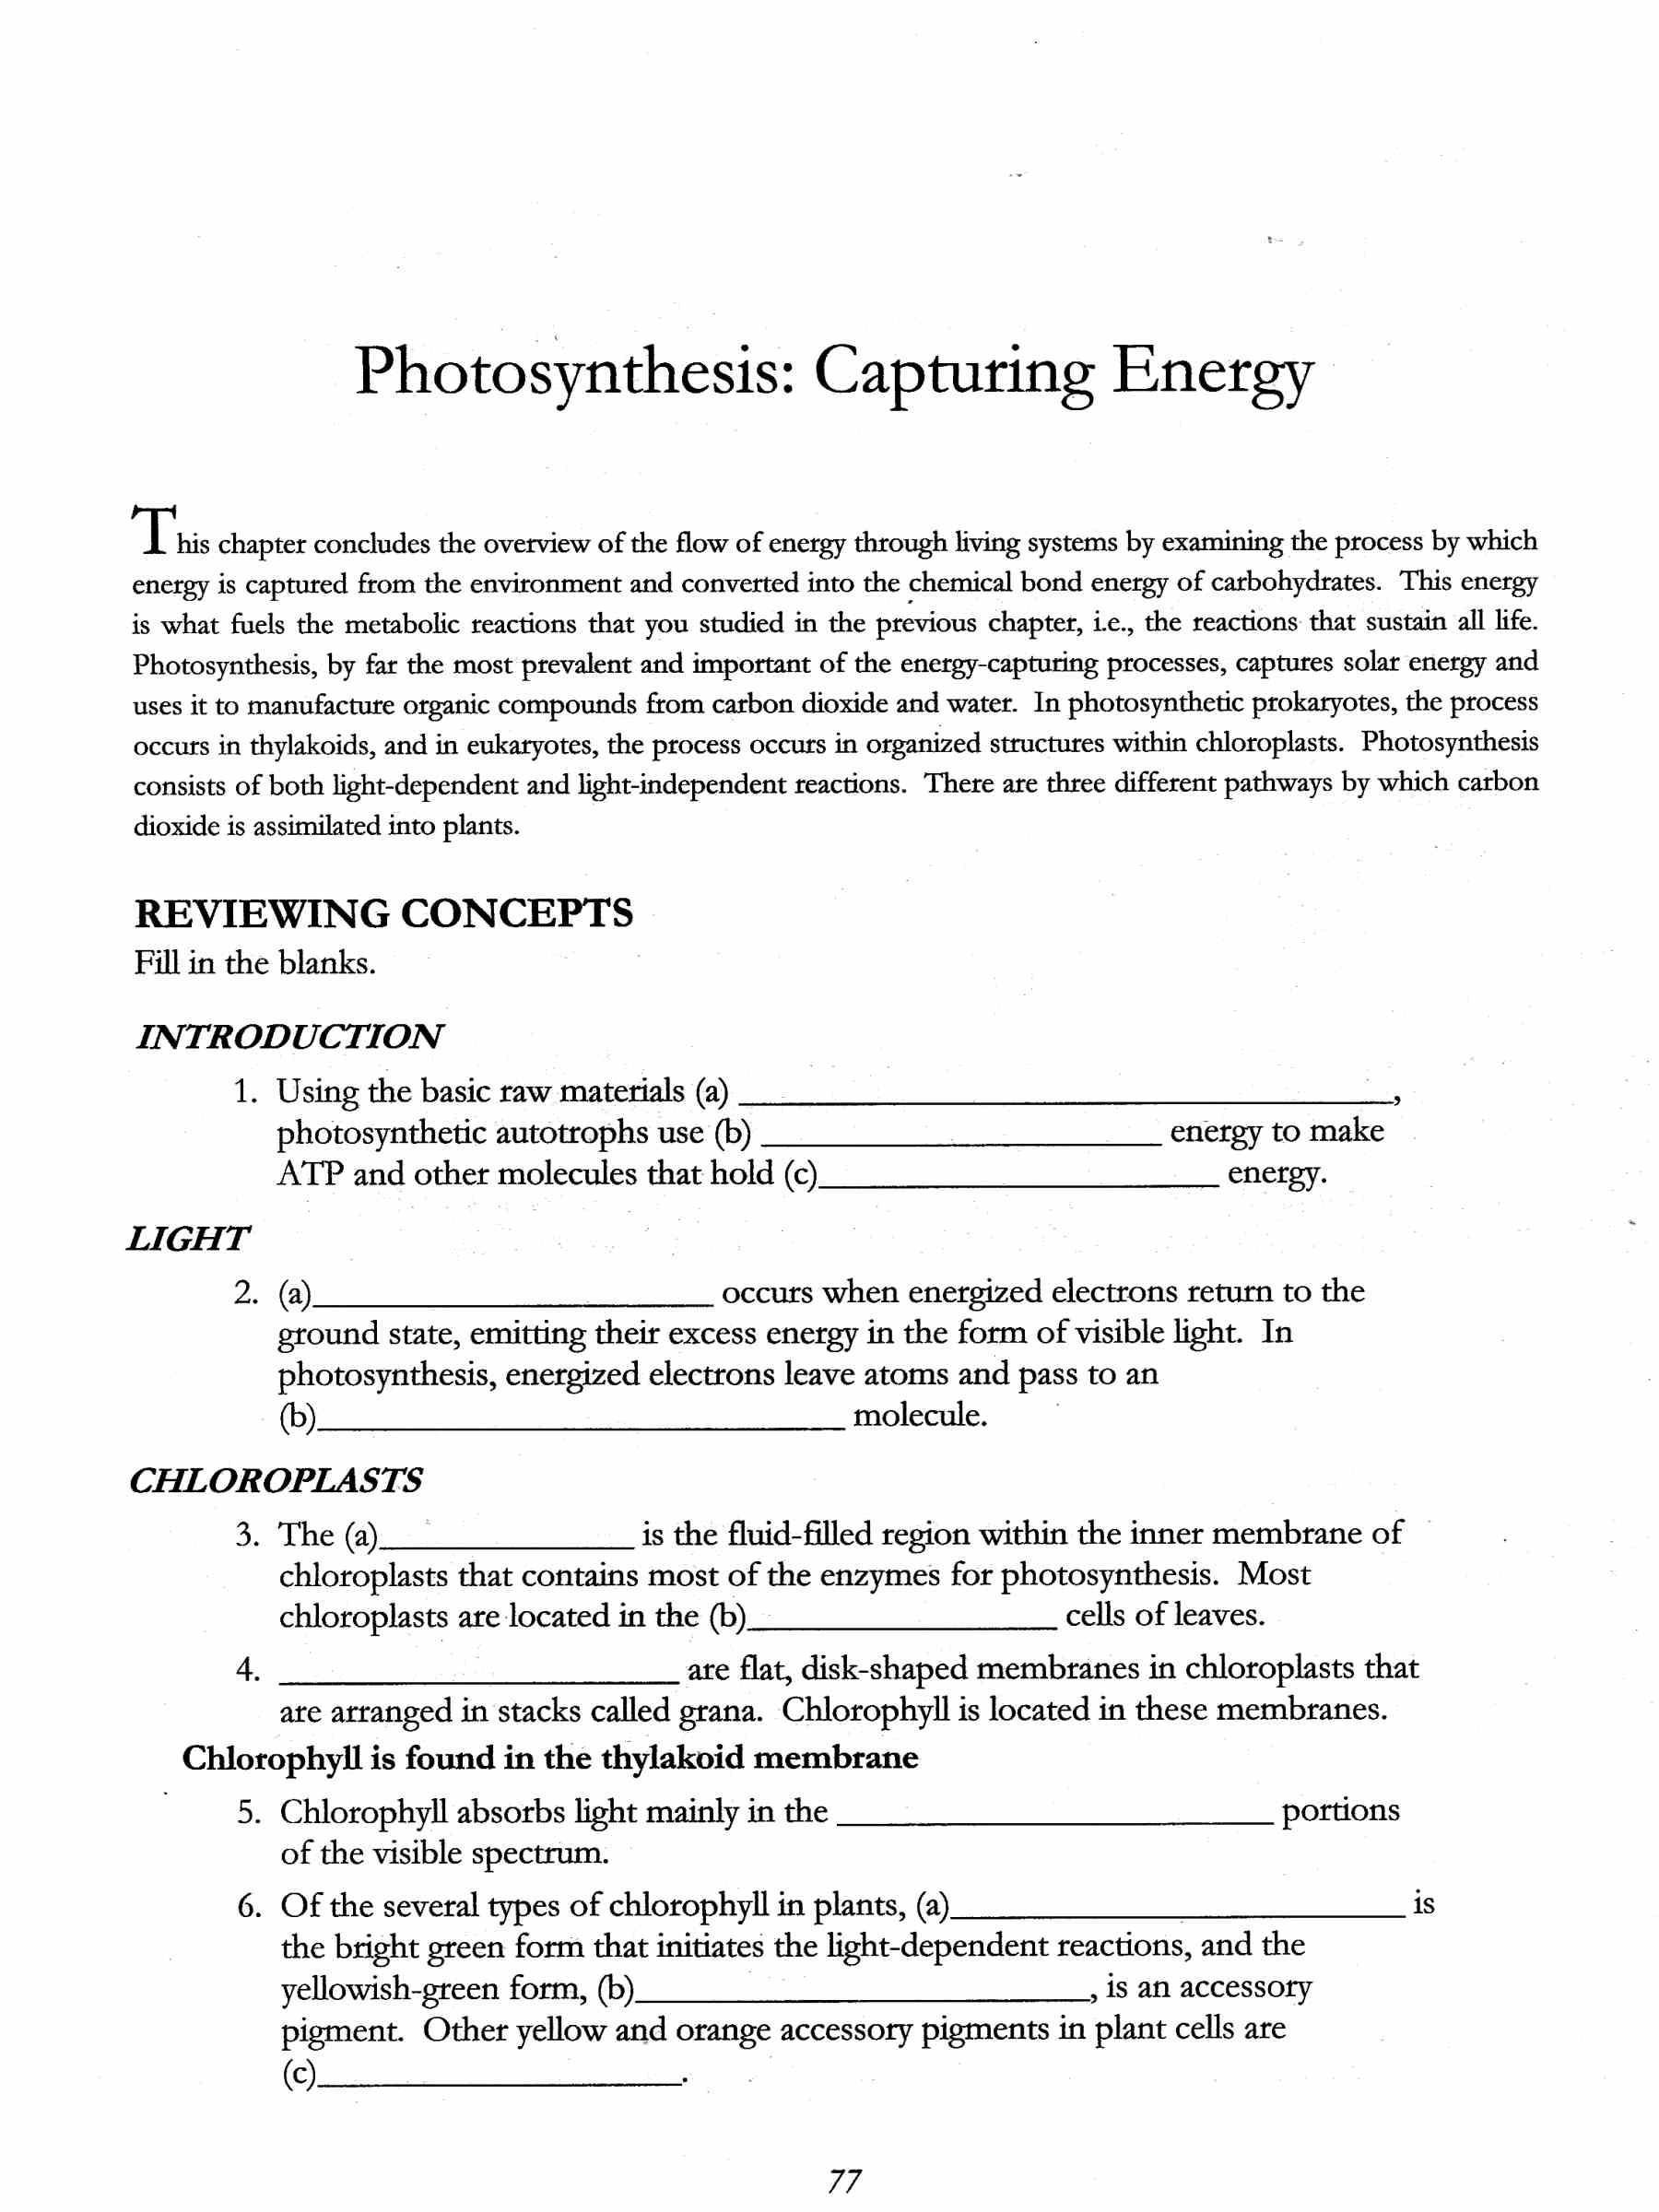 Photosynthesis Worksheet - carolinabeachsurfreport